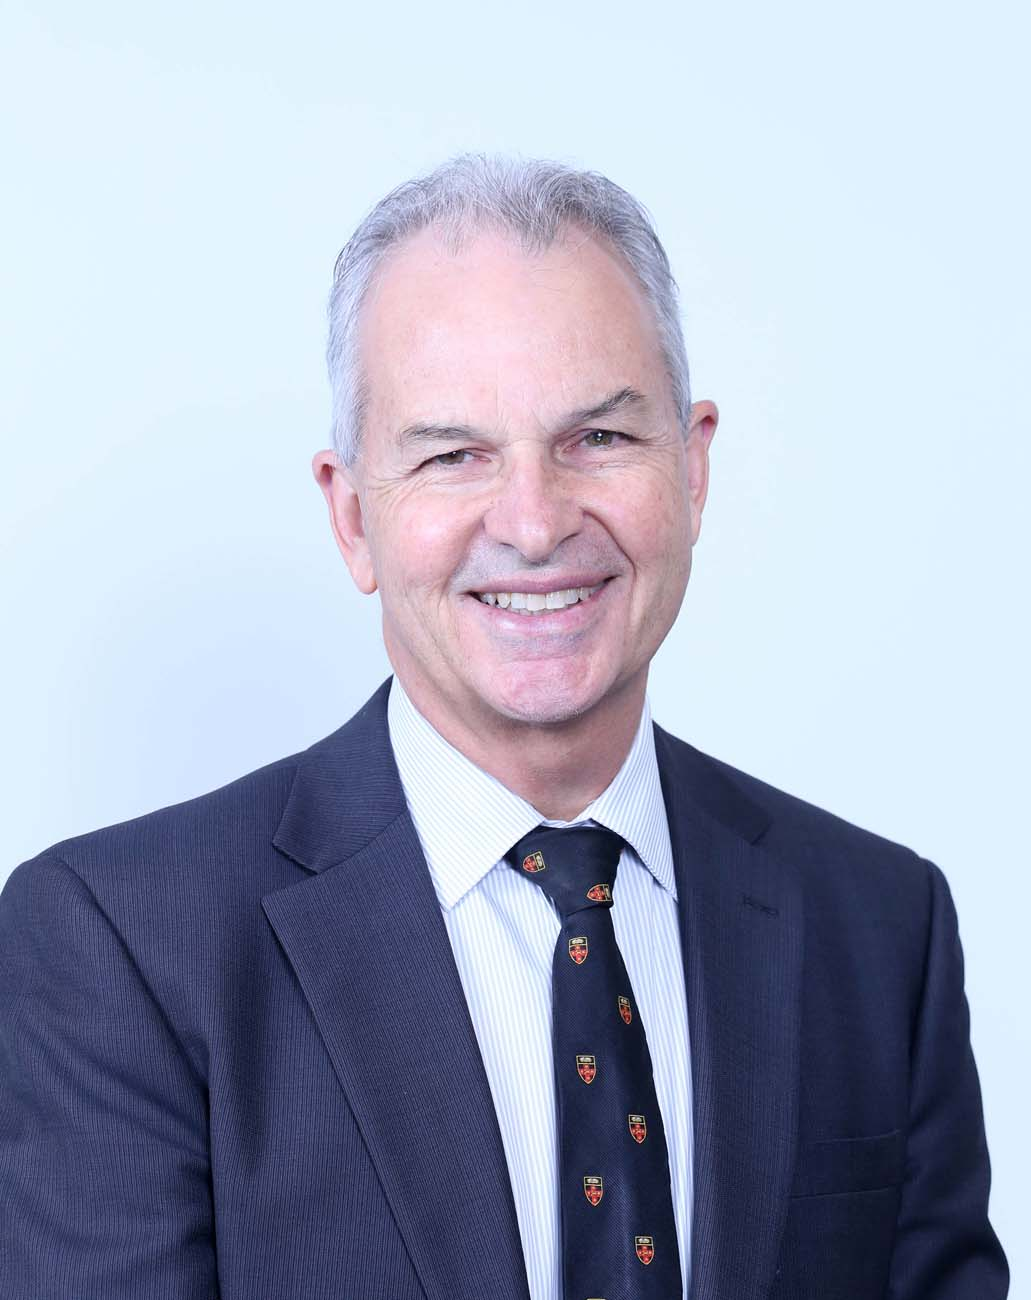 Professor Mark Ashley Brown